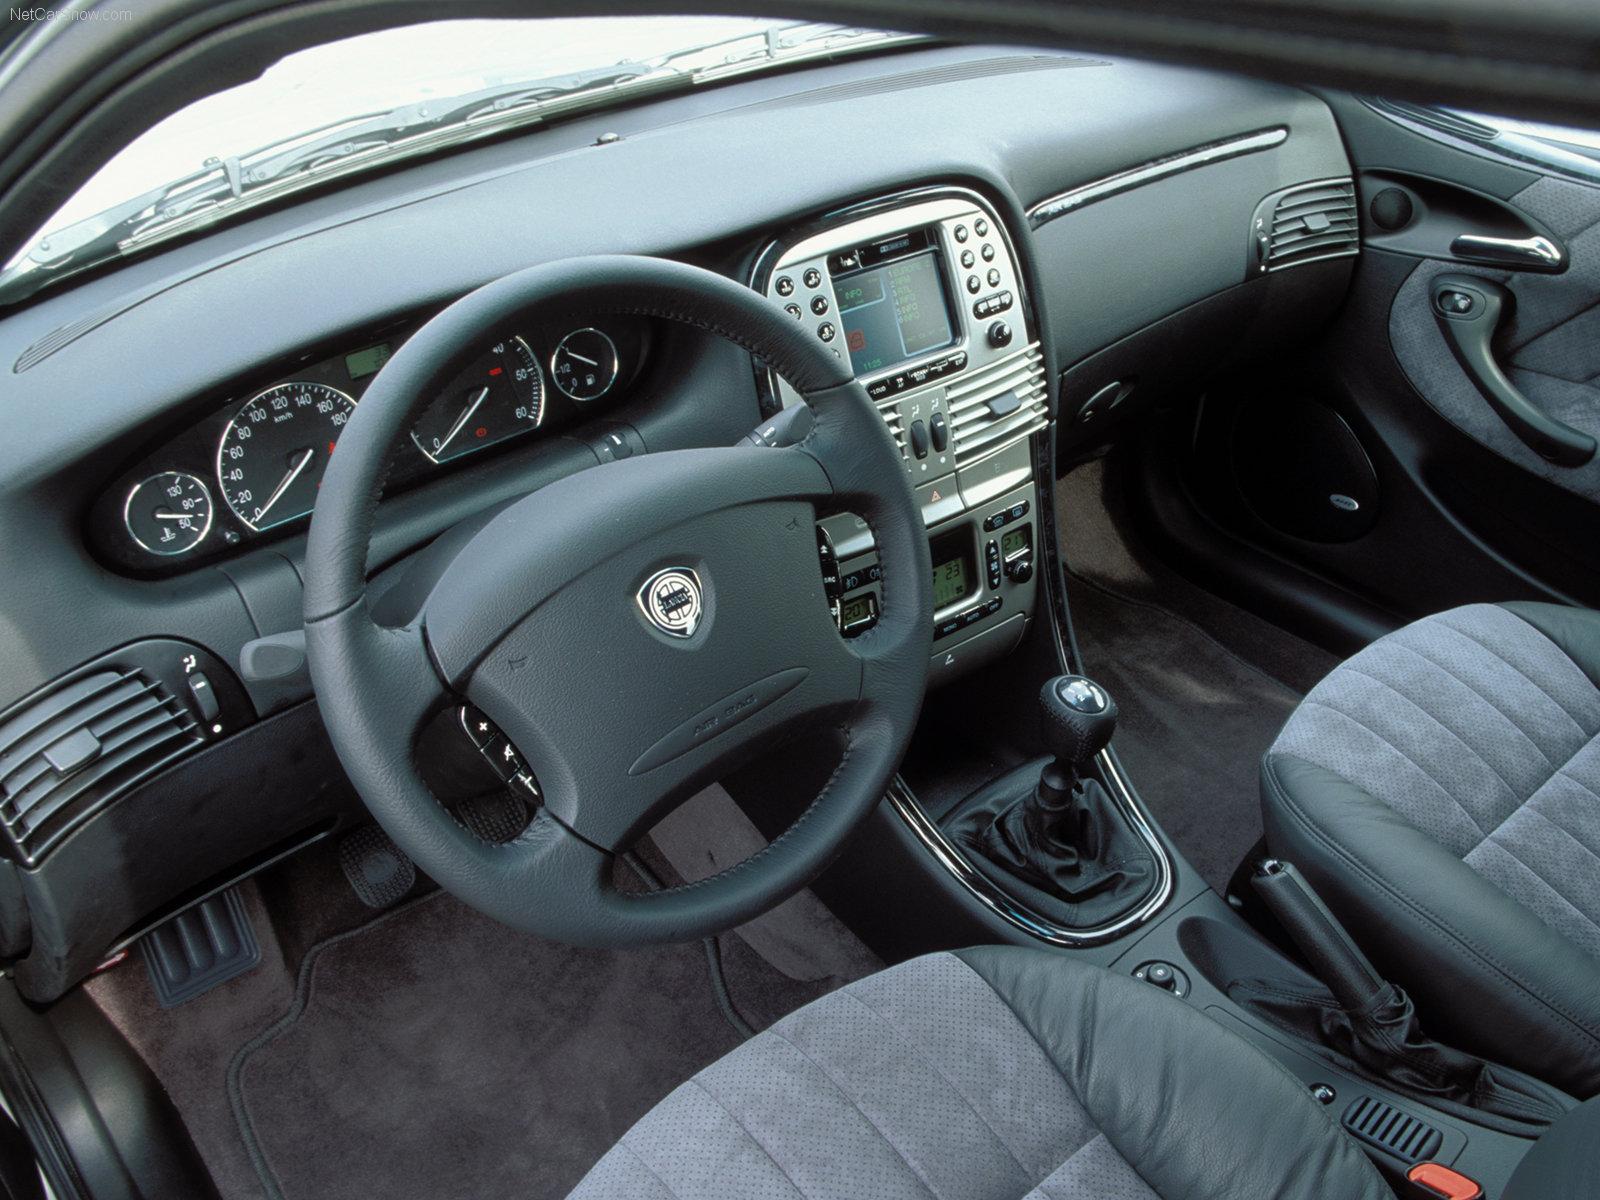 Lancia Lybra Intensa Photos Photogallery With 4 Pics